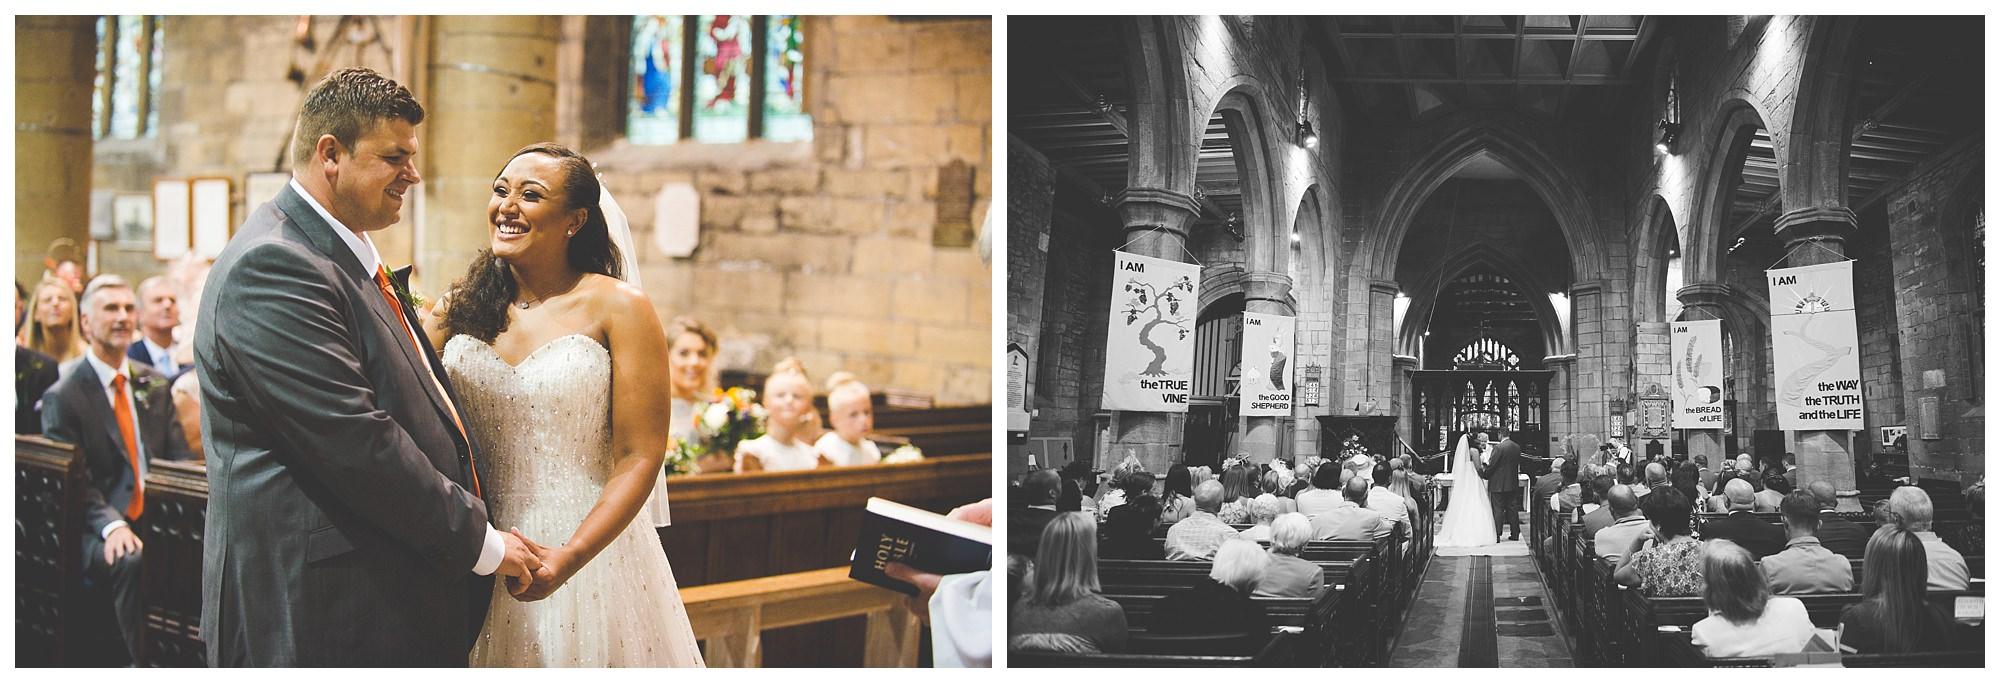 Walton-Hall-Wedding-Photography_0032